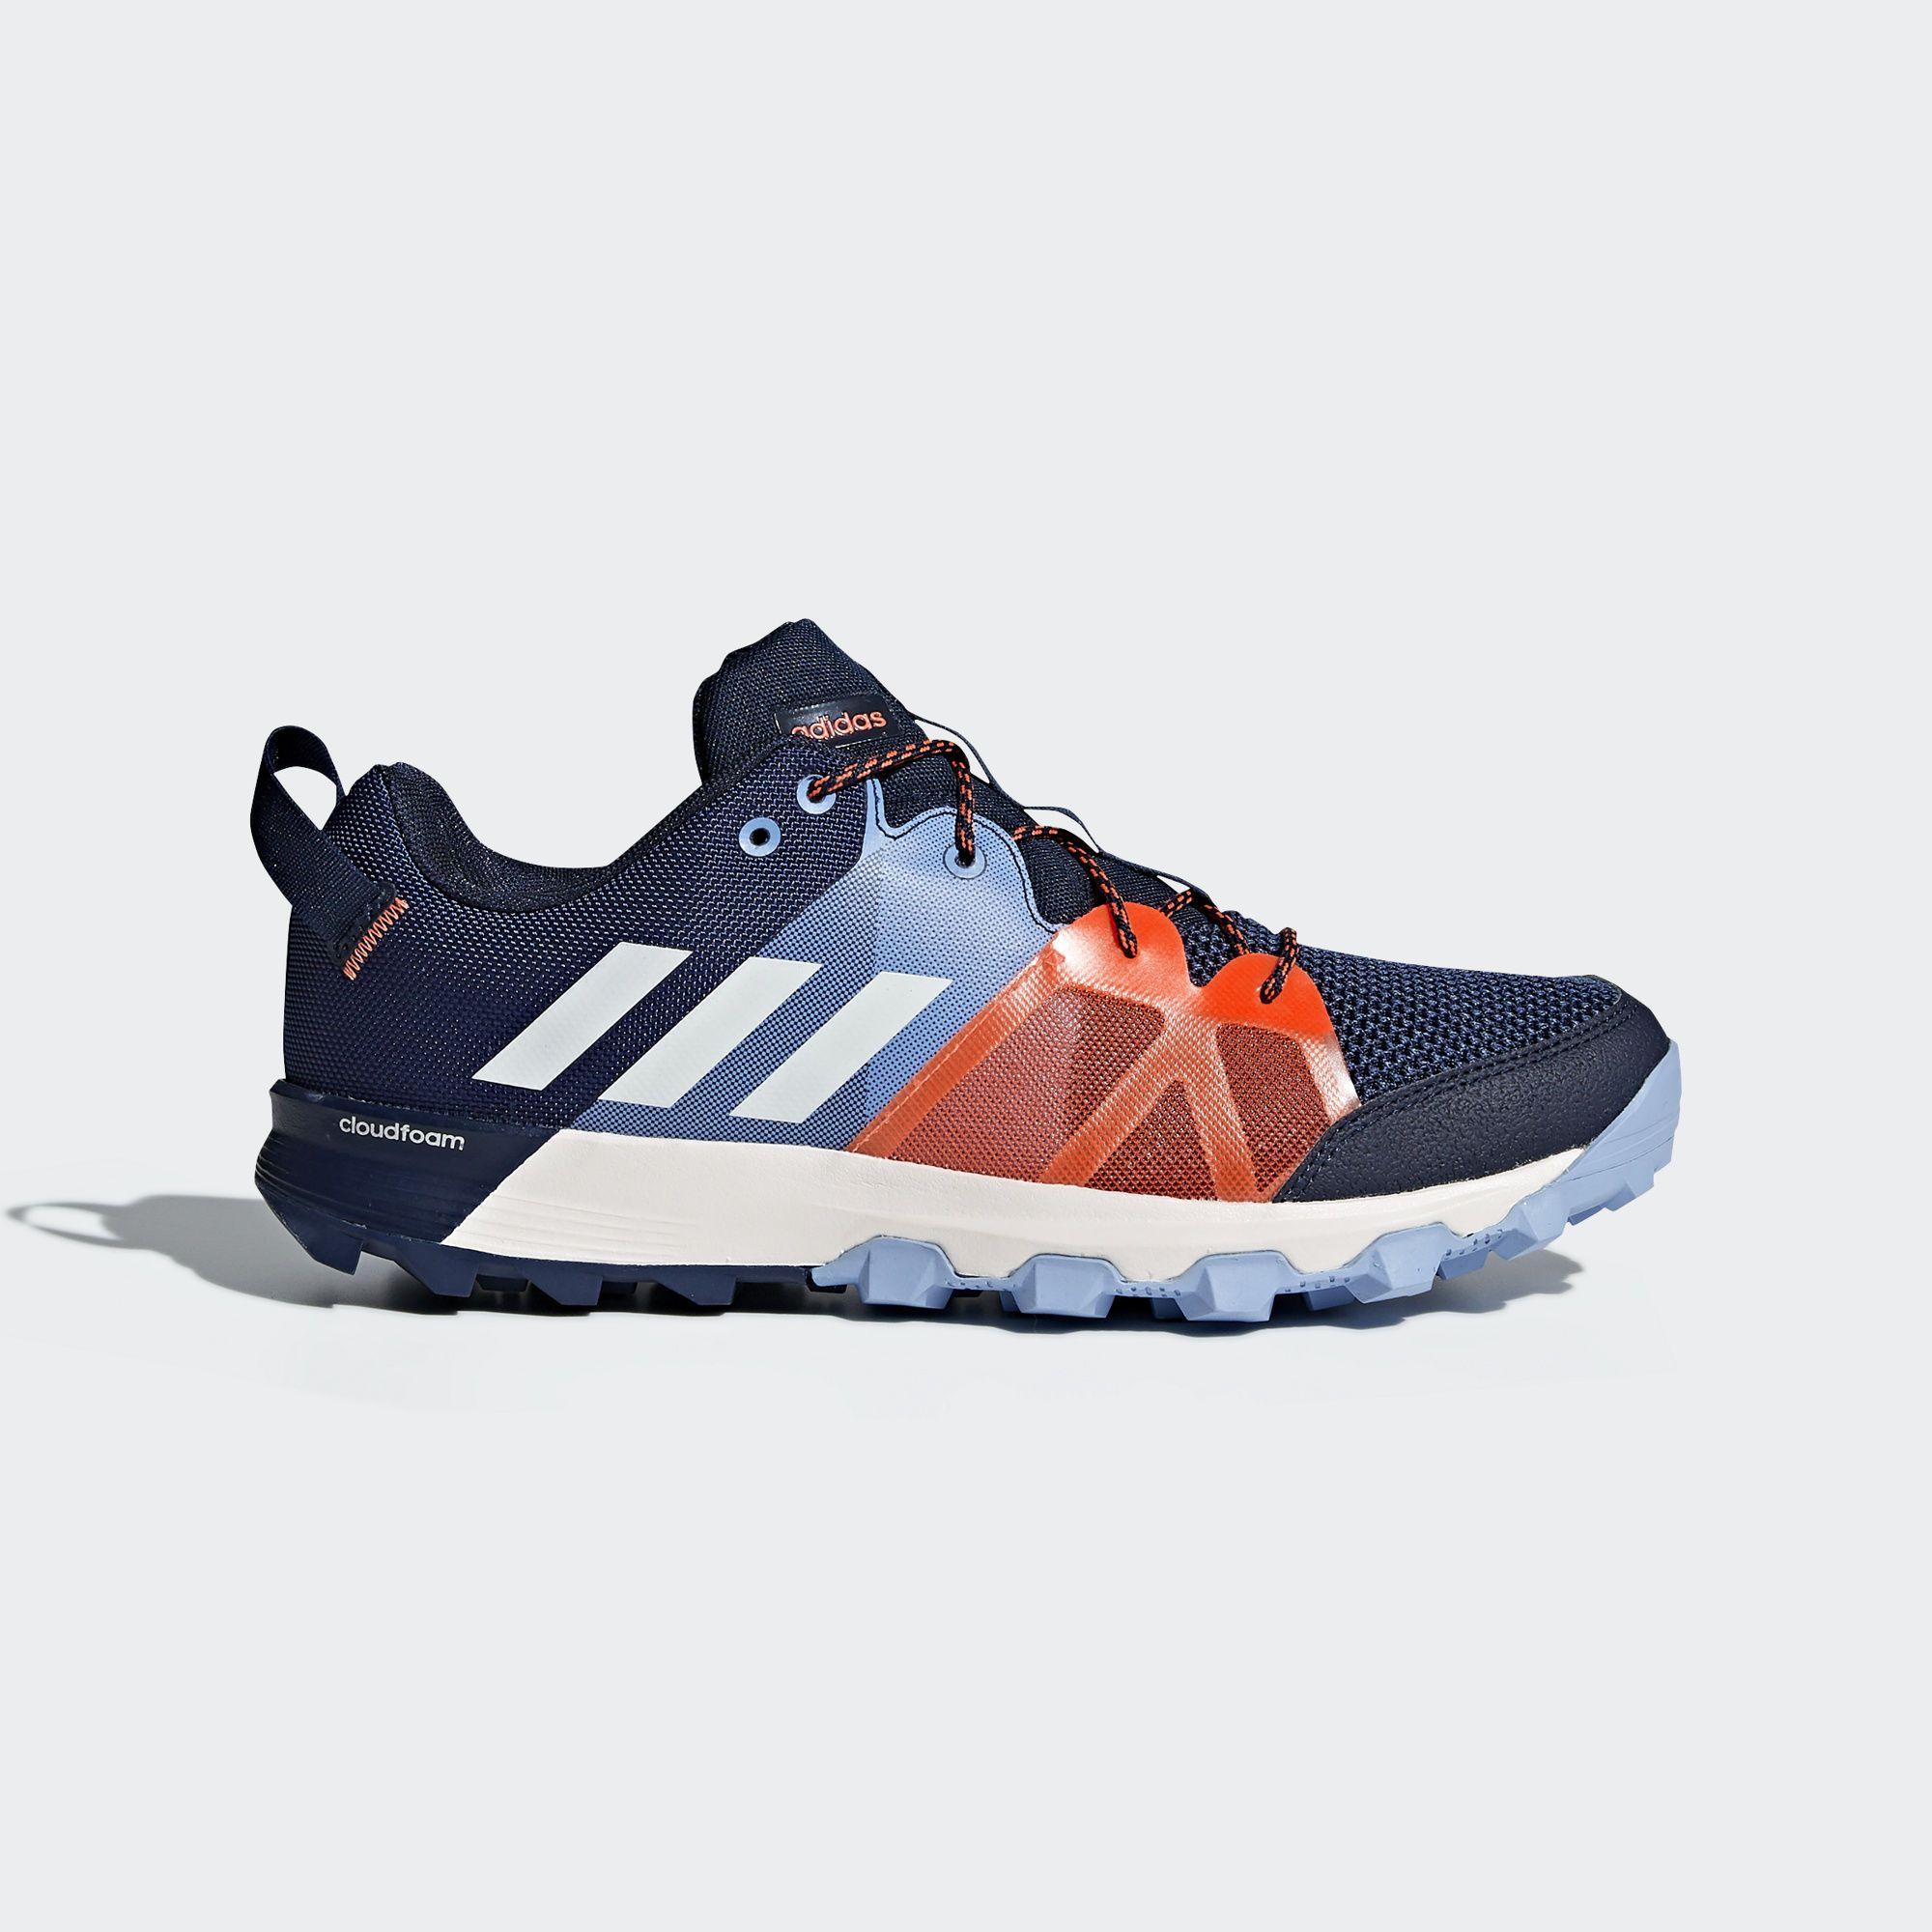 1de86efc Esta zapatilla de trail running para hombre te proporciona la ...